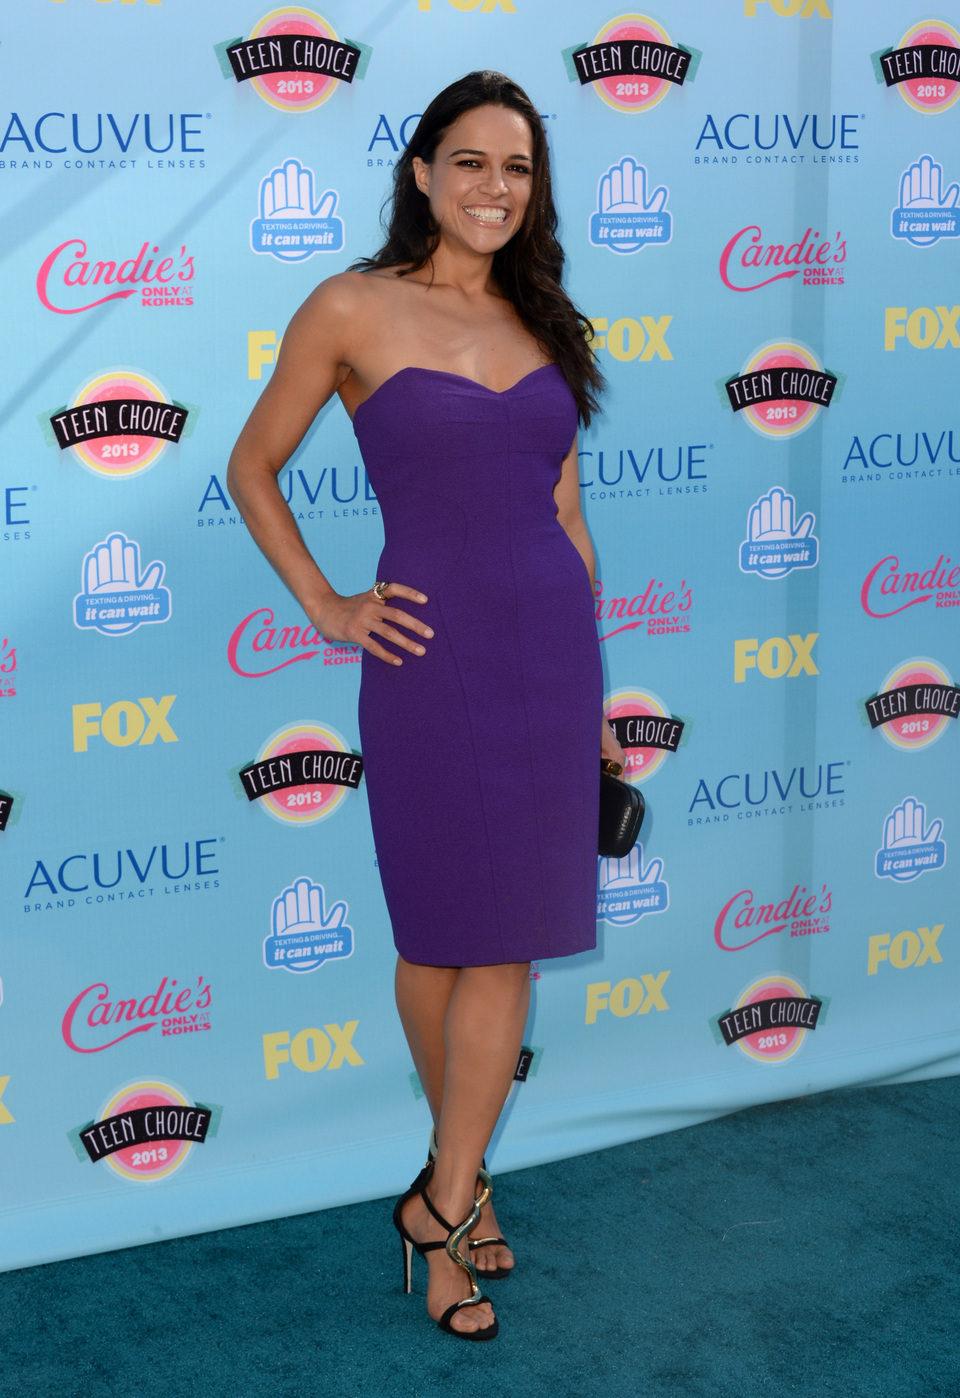 Michelle Rodriguez en los Teen Choice Awards 2013